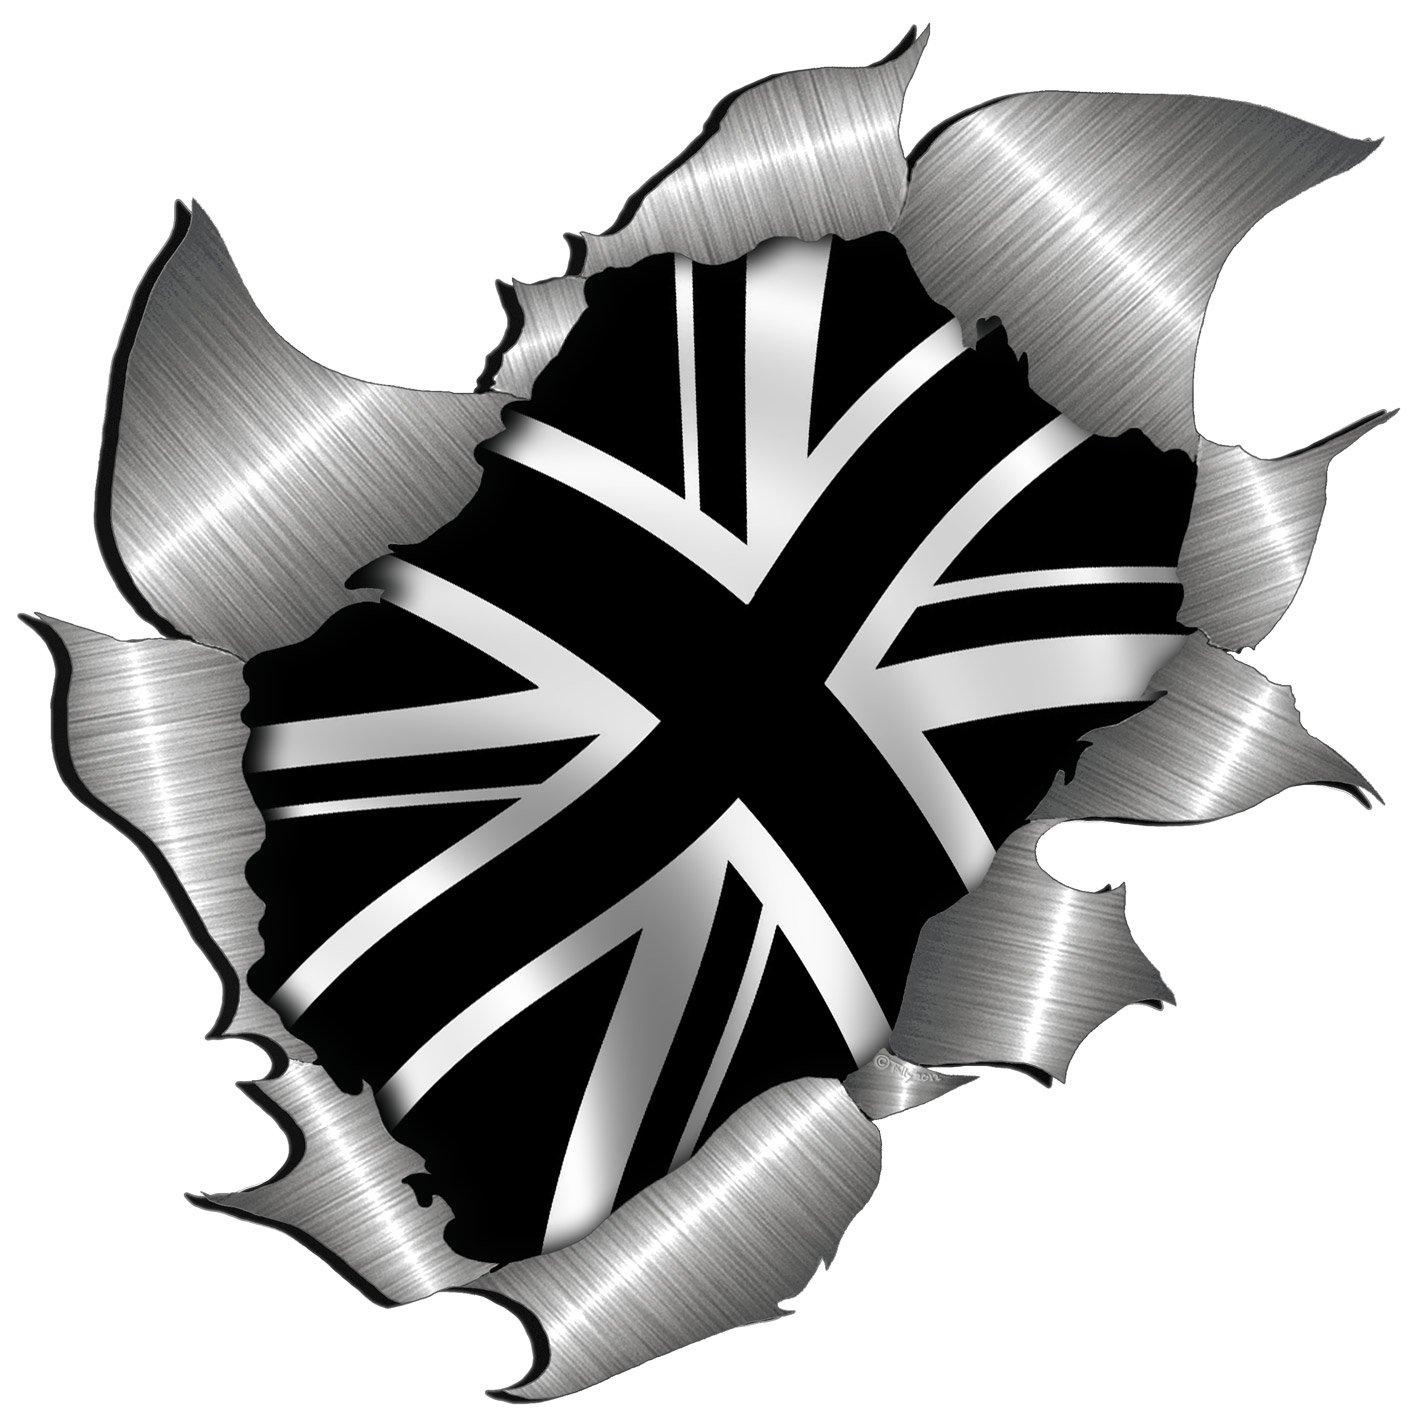 metal rip open,British Black union jack flag sticker.150mm